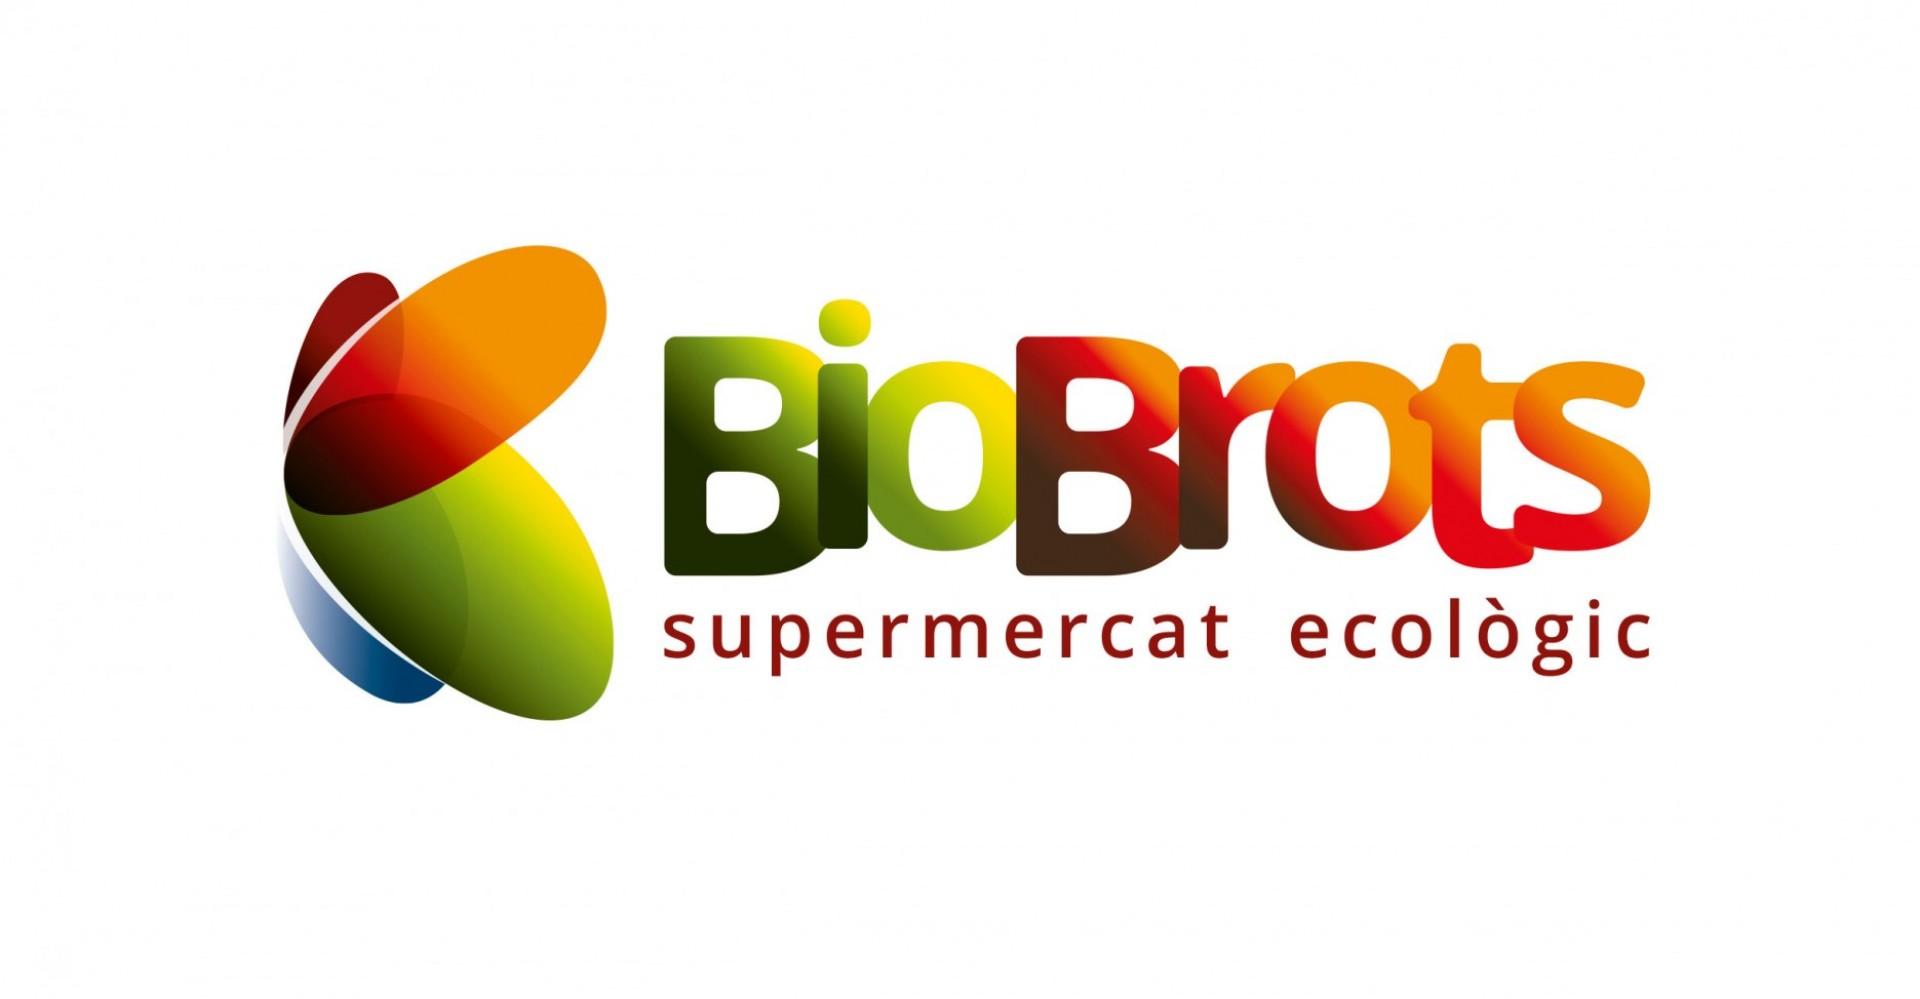 BioBrots